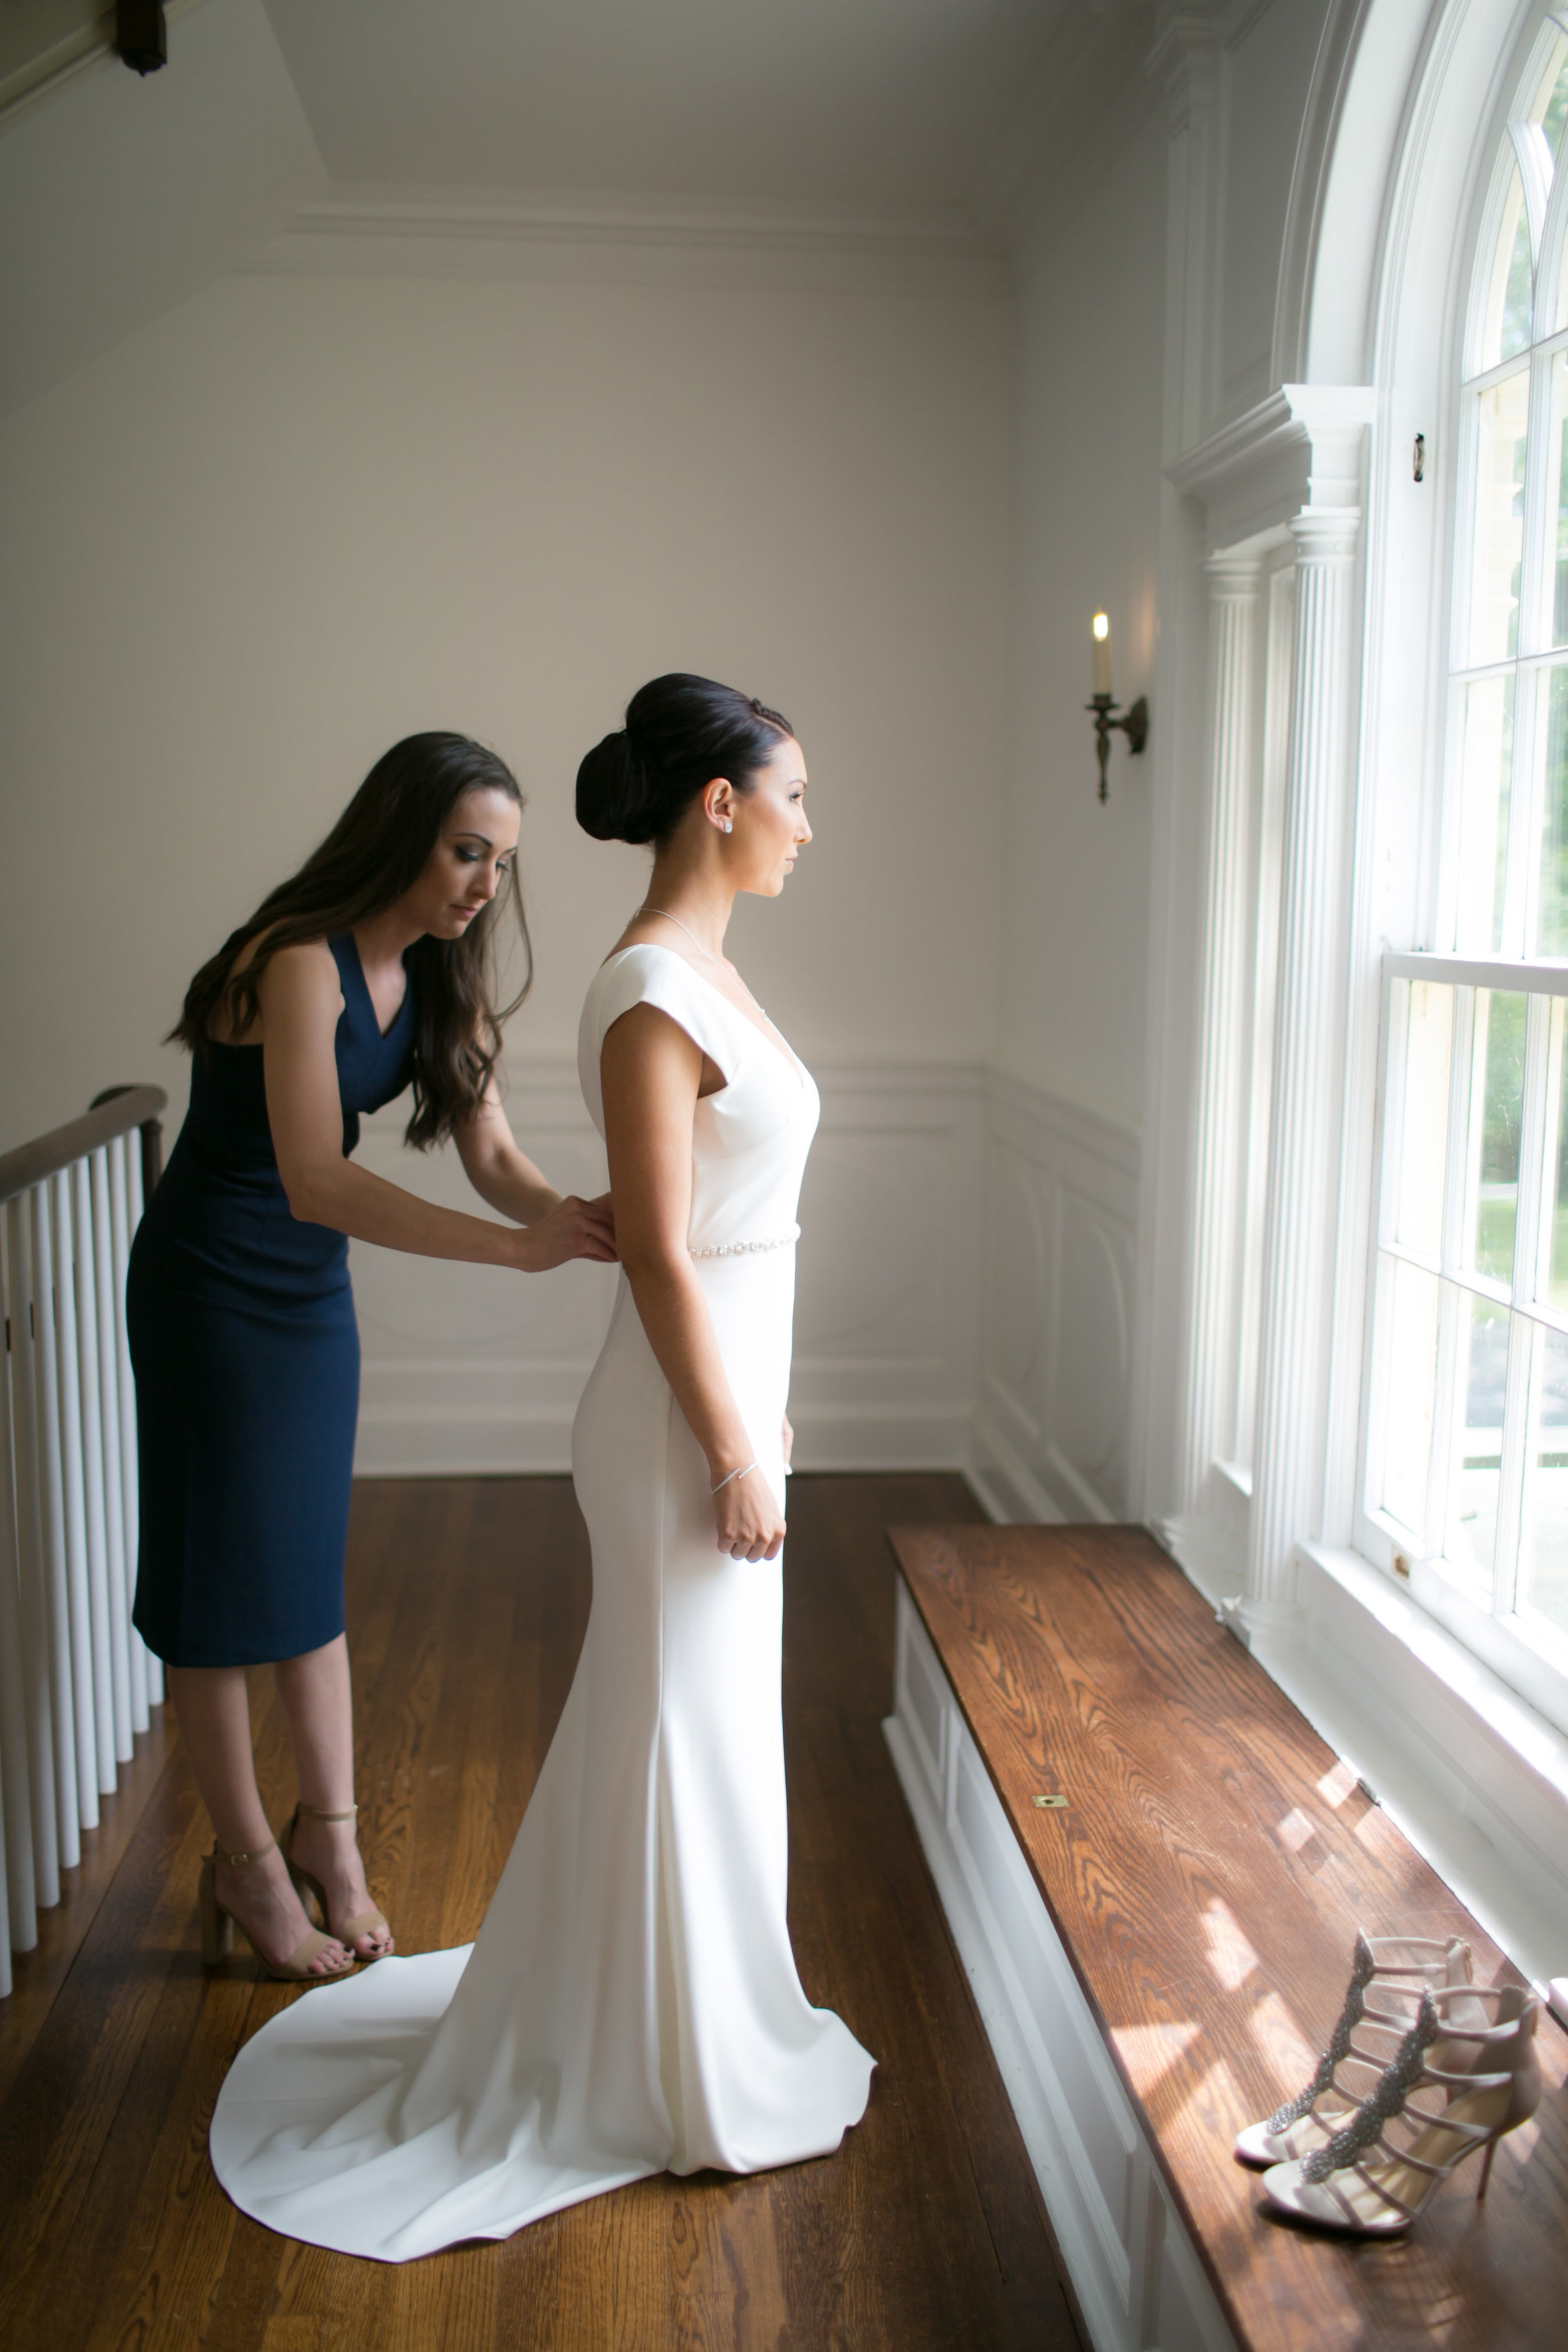 Pure elegance events Tynise Kee dc wedding planner va wedding planner rust manor house leesburg -0005.jpg